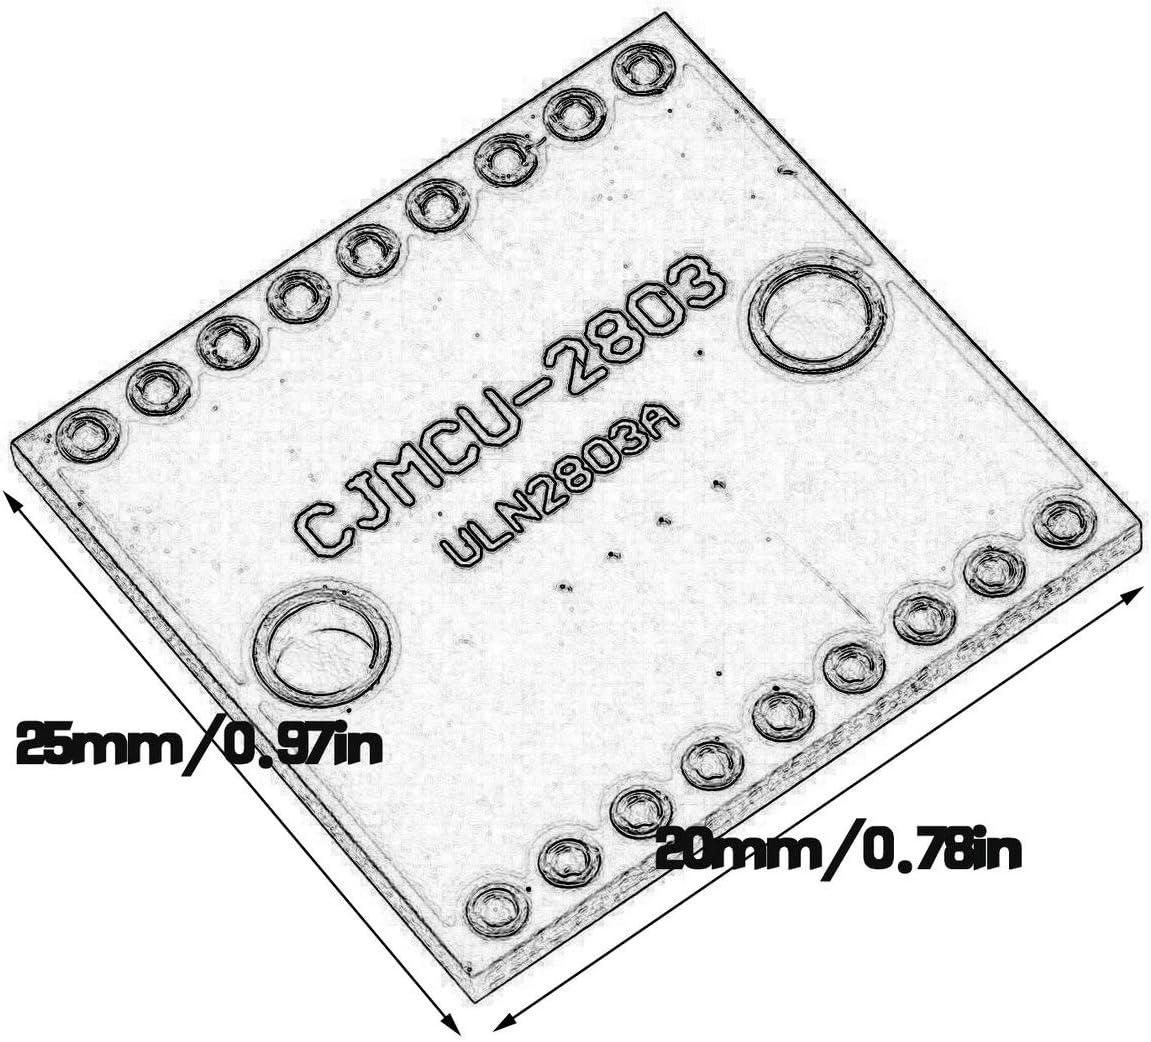 lila Biyi ULN2803A Darlington Rohr Hochdruck gro/ßer Stromtreibermodul